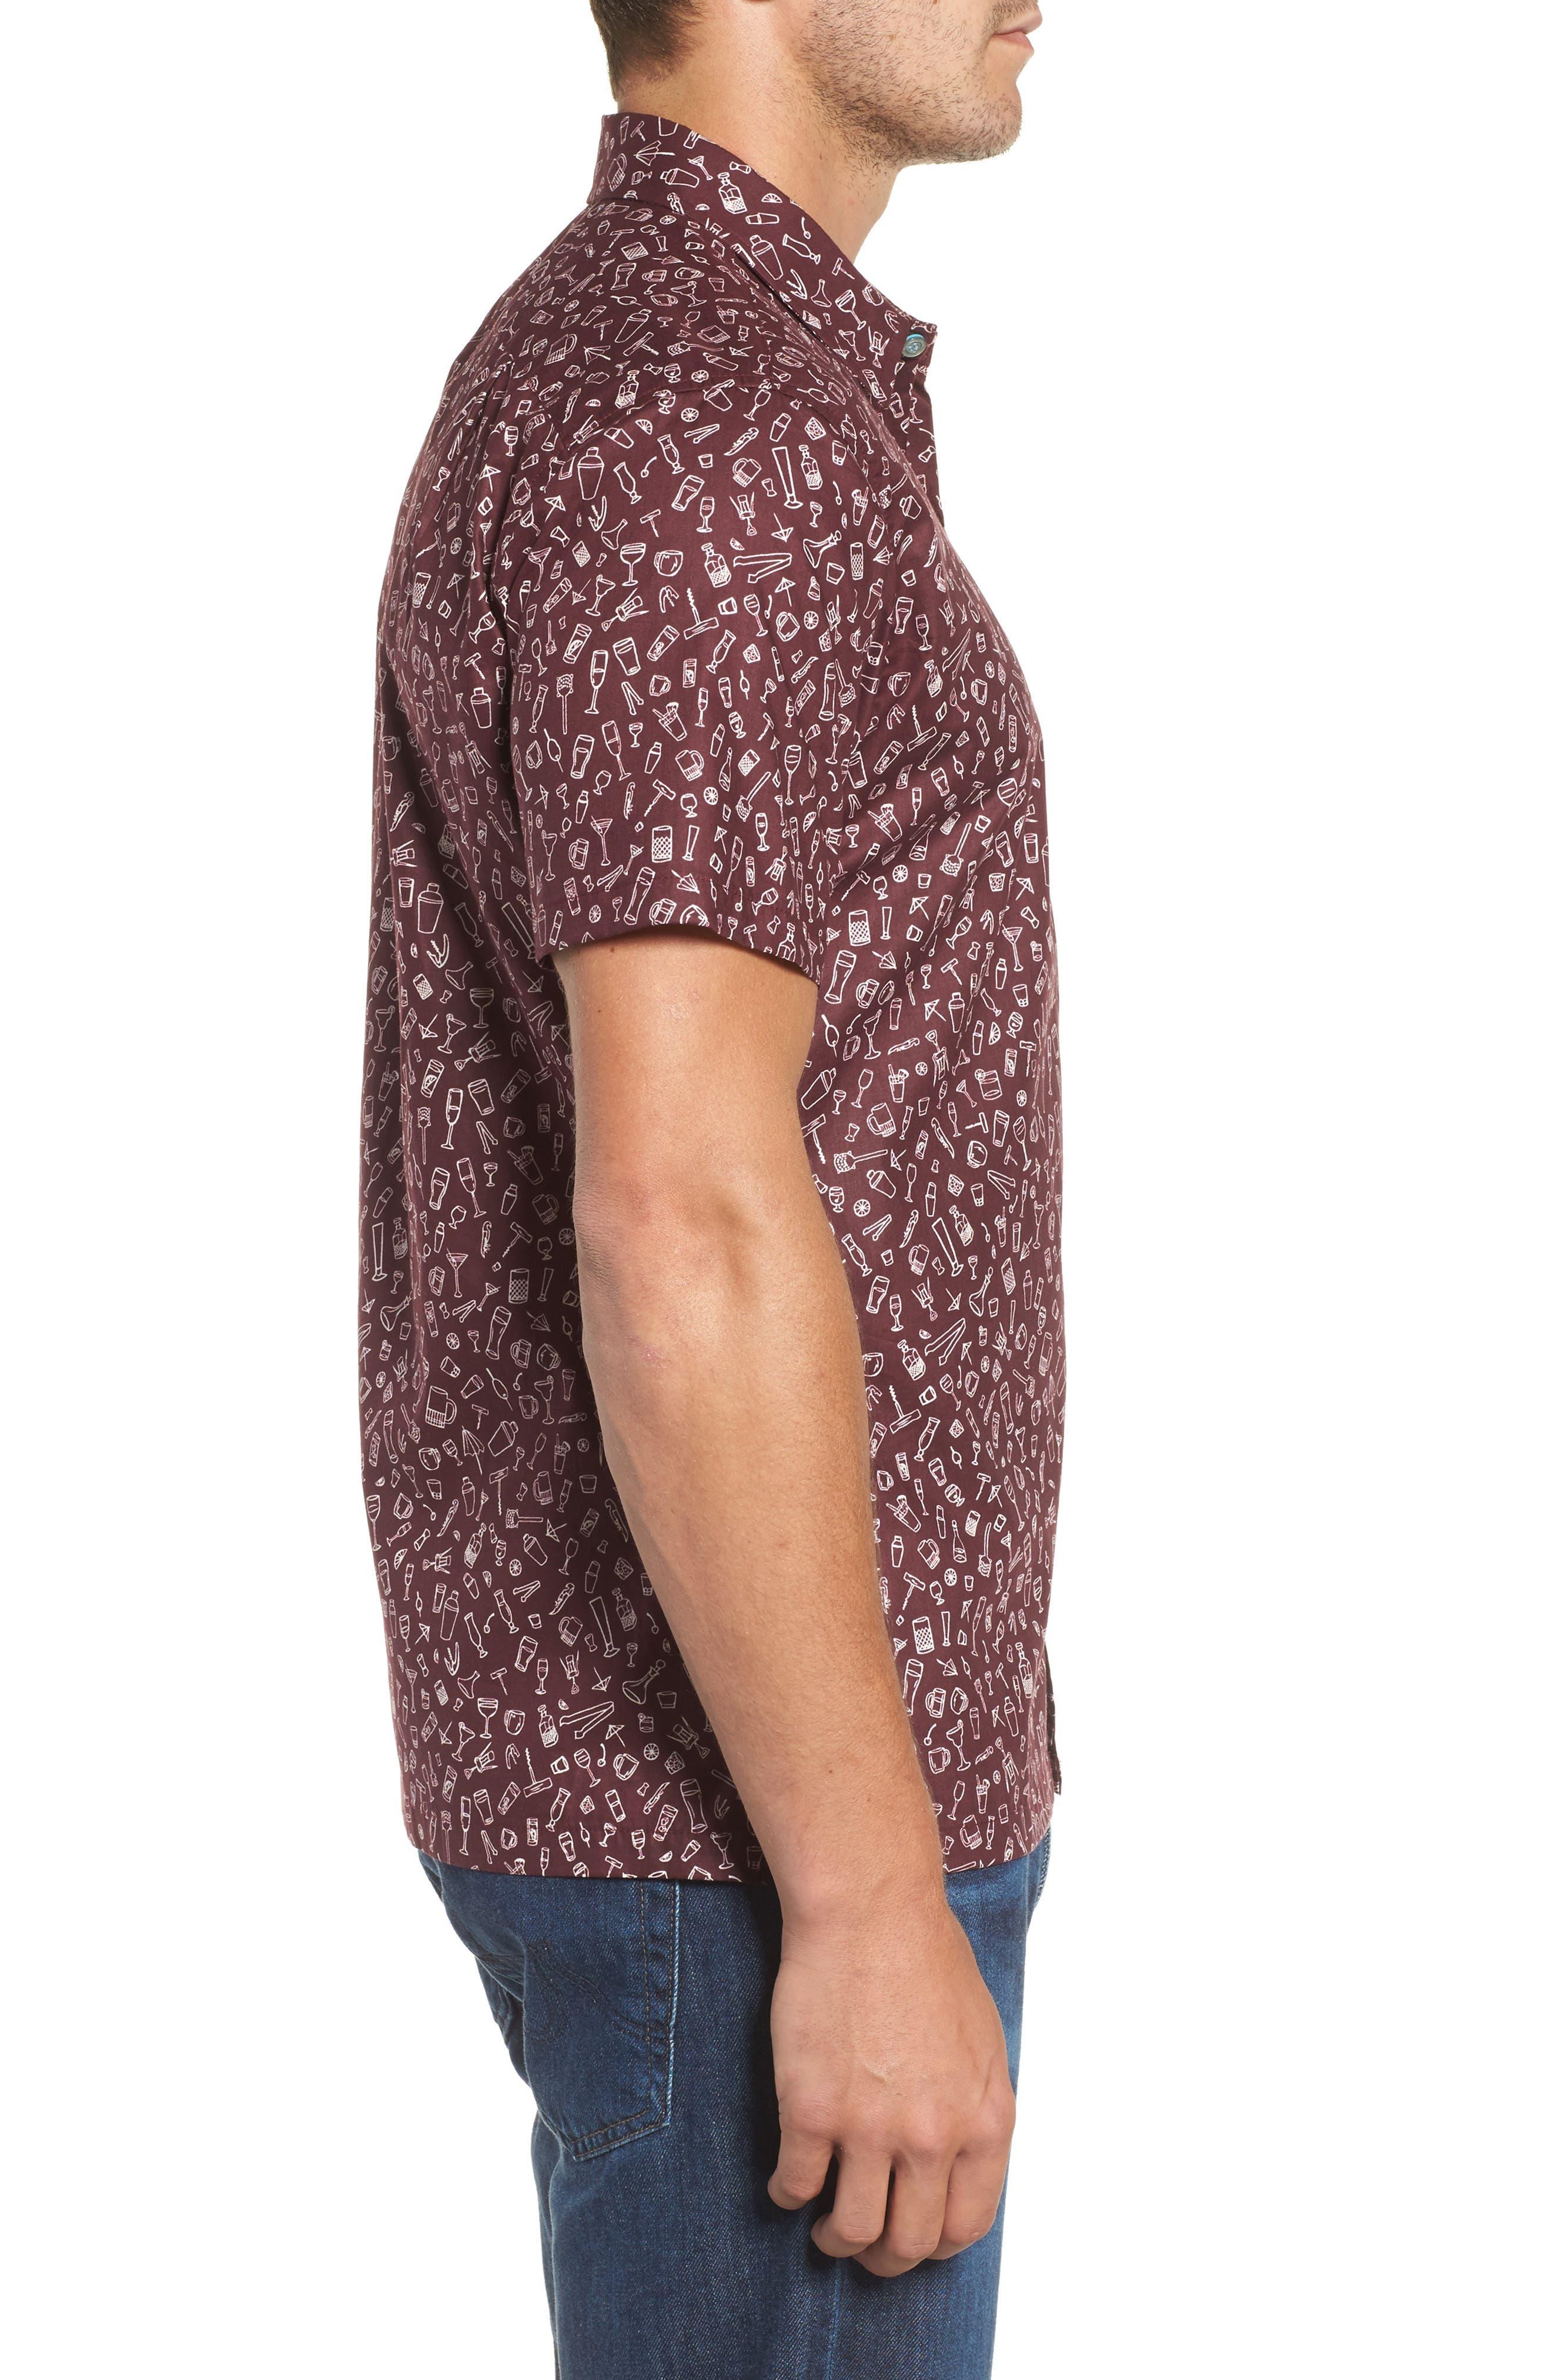 5 PM Slim Fit Camp Shirt,                             Alternate thumbnail 3, color,                             Wine